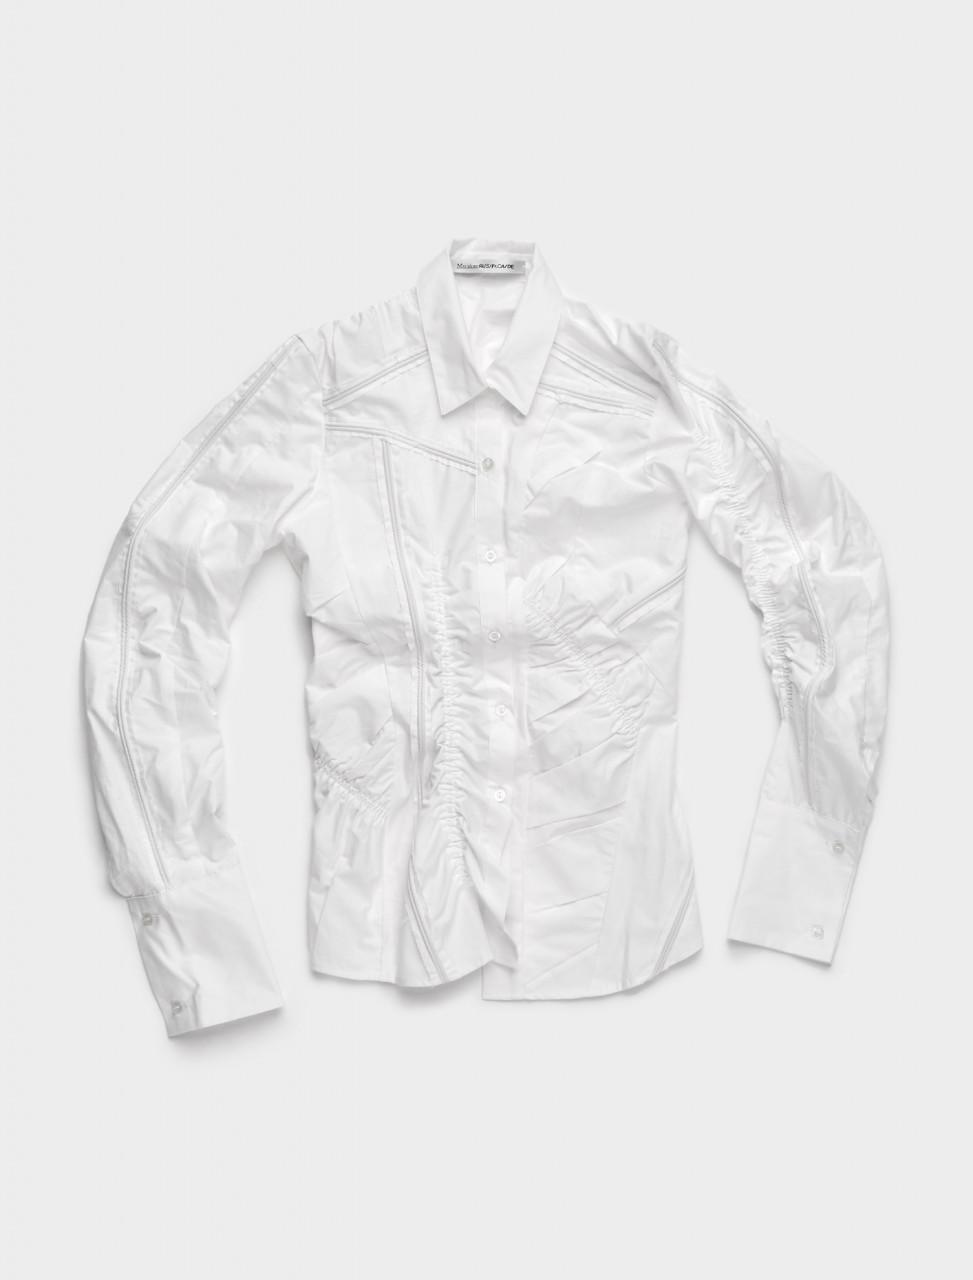 342-AW20BLANC MAINLINE BLANC SHIRT WHITE